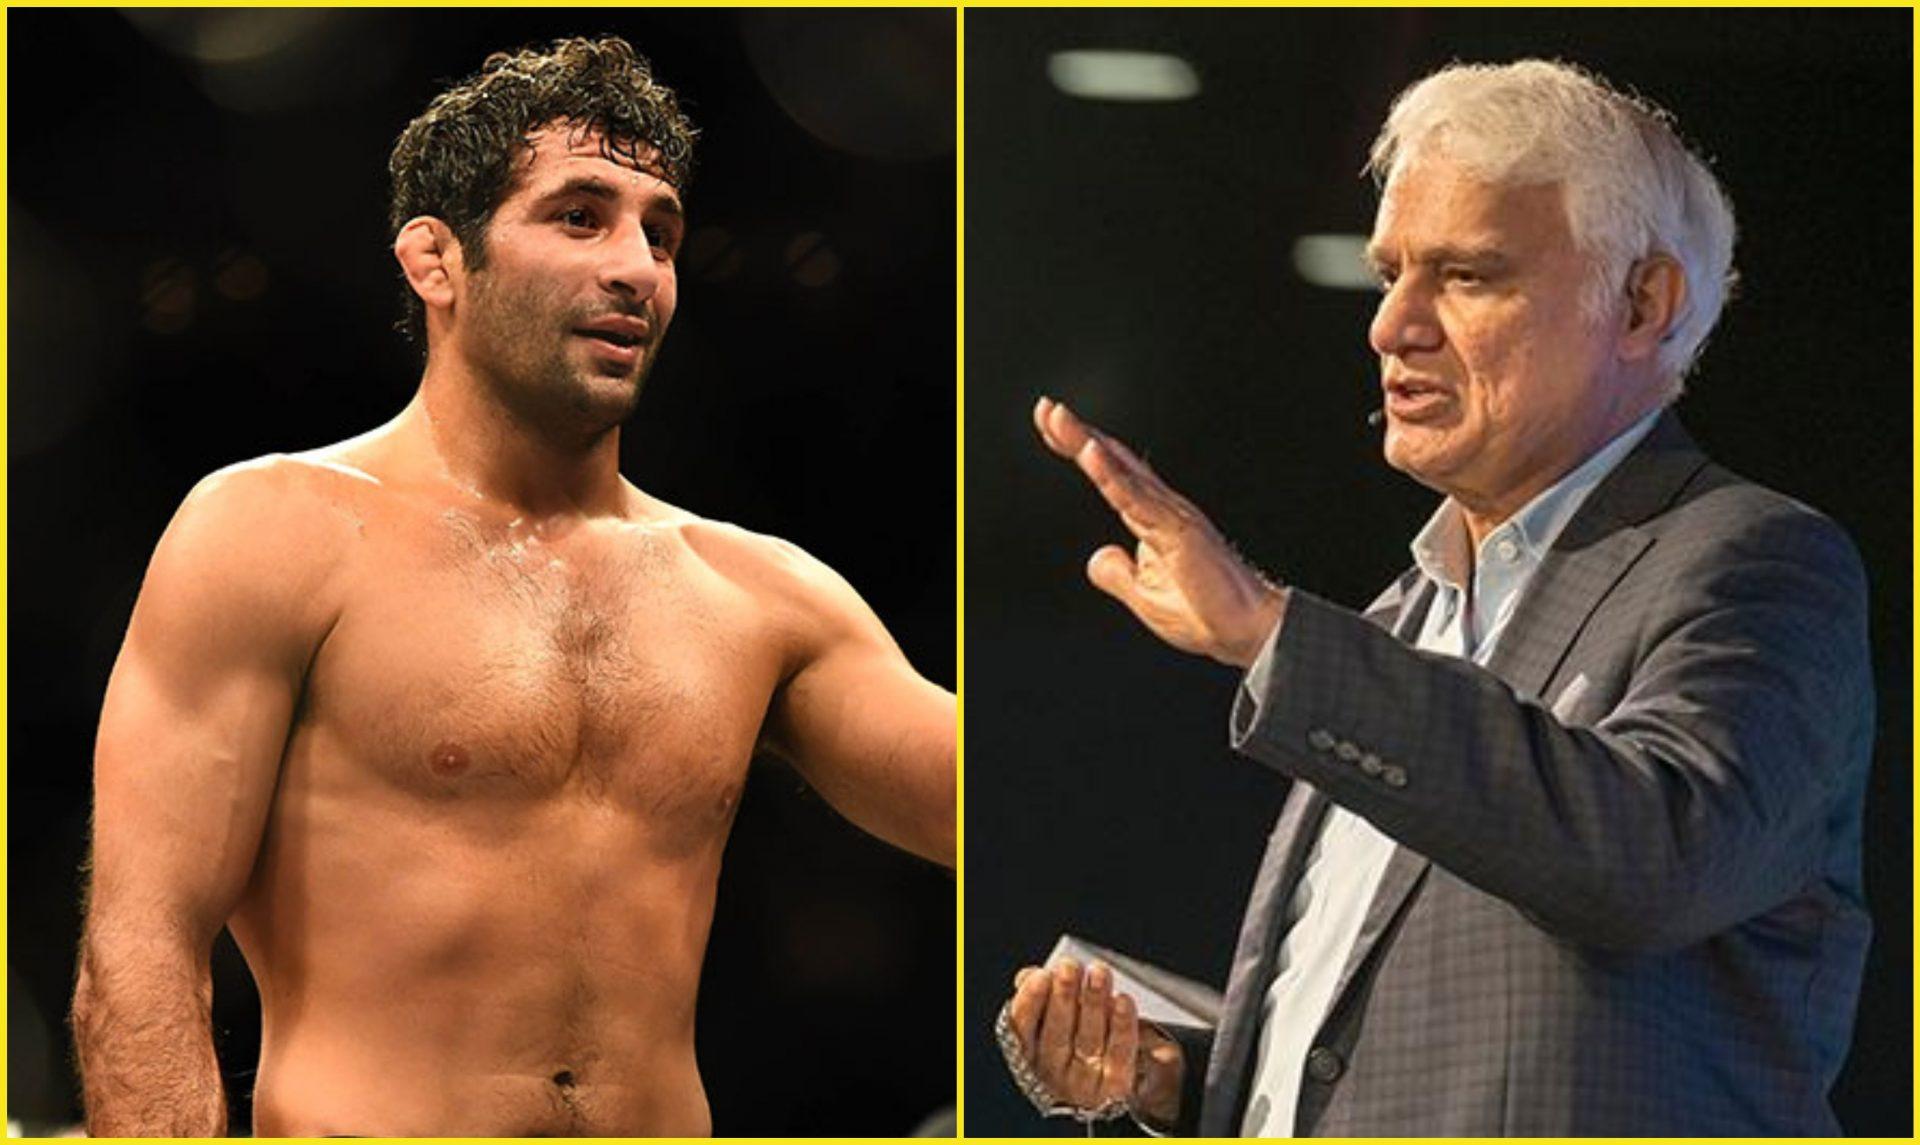 UFC fighter Beneil Dariush pays tribute to Chennai born author Ravi Zacharias - Dariush